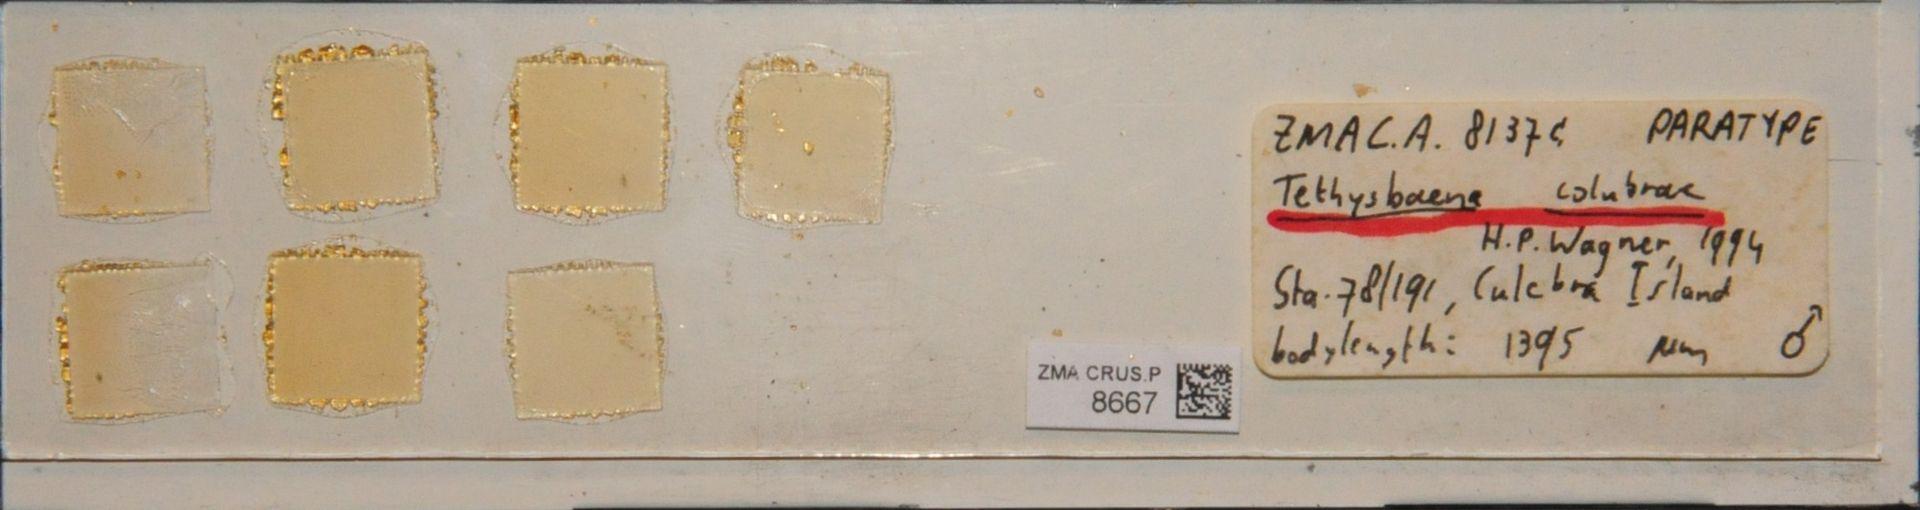 ZMA.CRUS.P.8667 | Tethysbaena colubrae H.P. Wagner, 1994